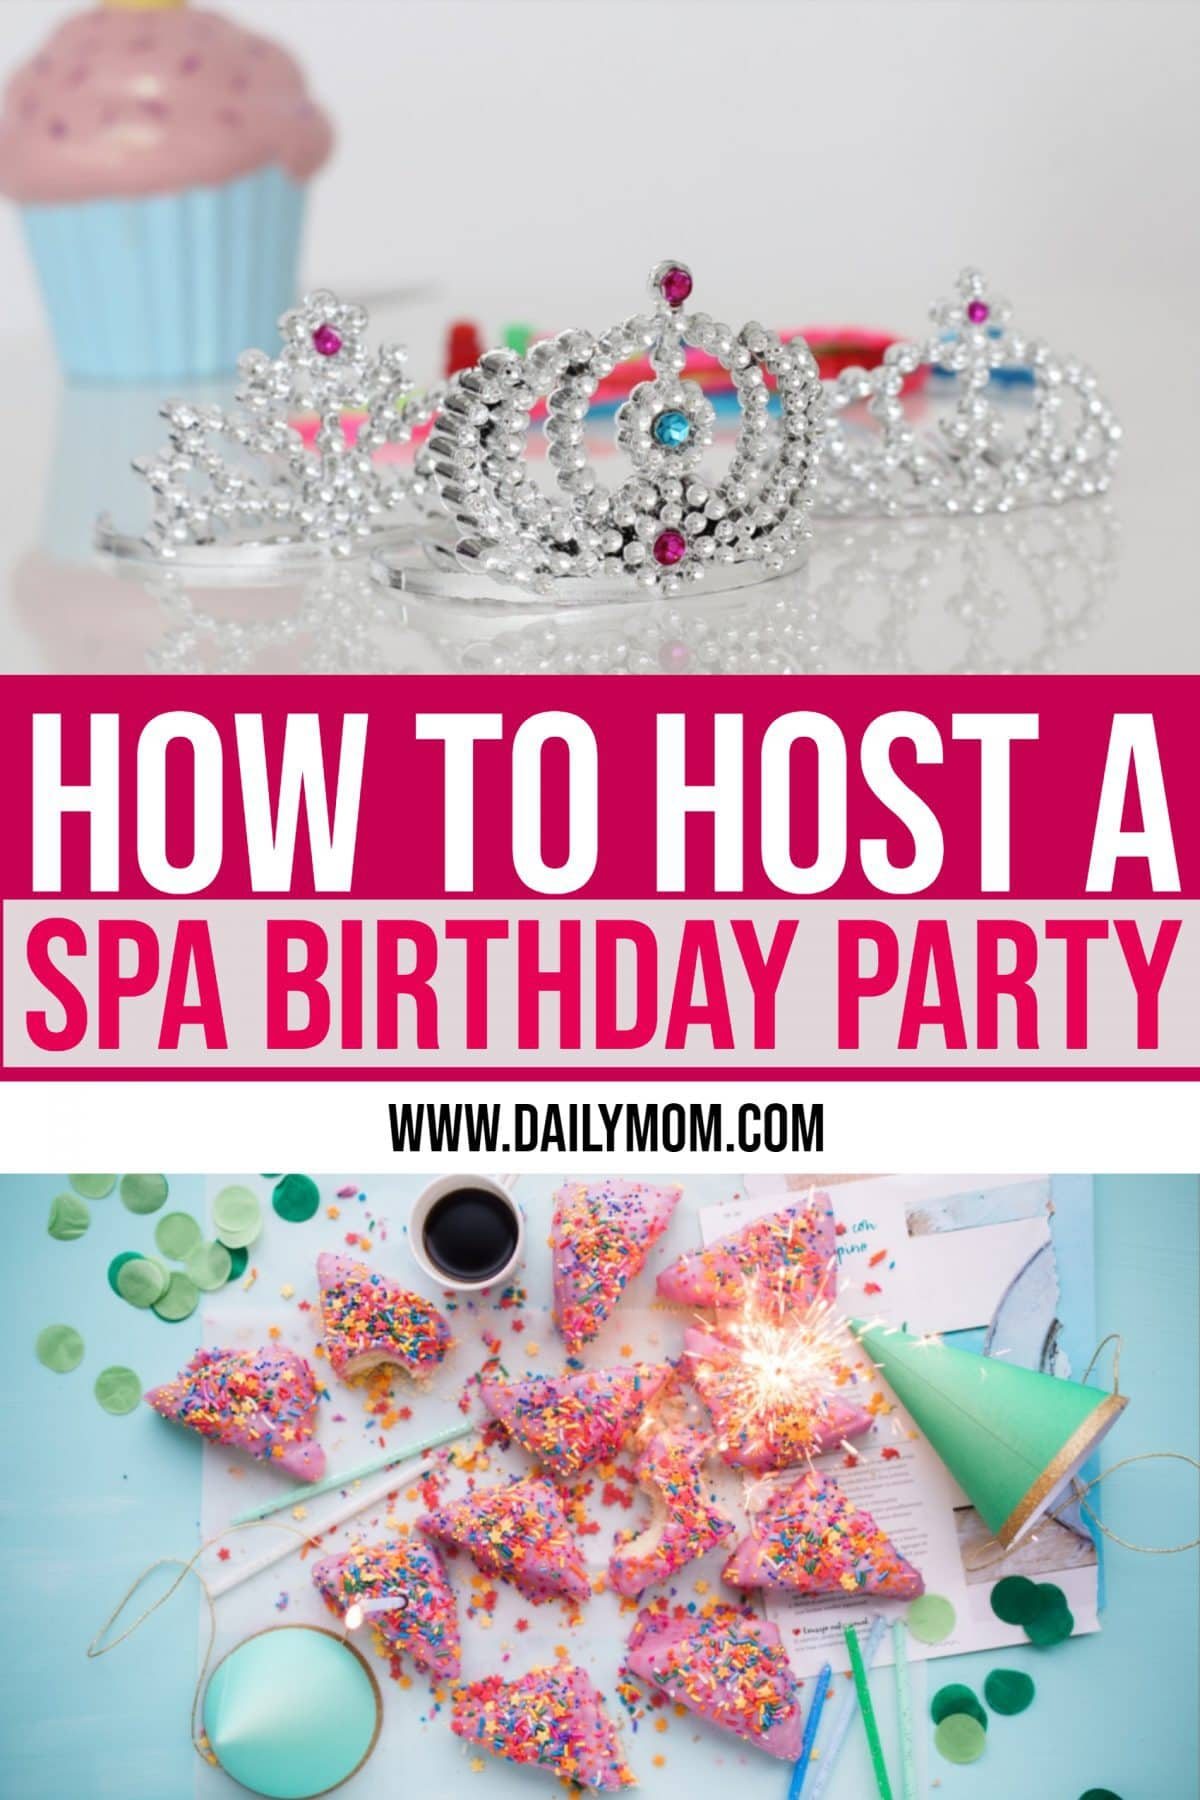 Daily Mom Parent Portal Spa Birthday Party